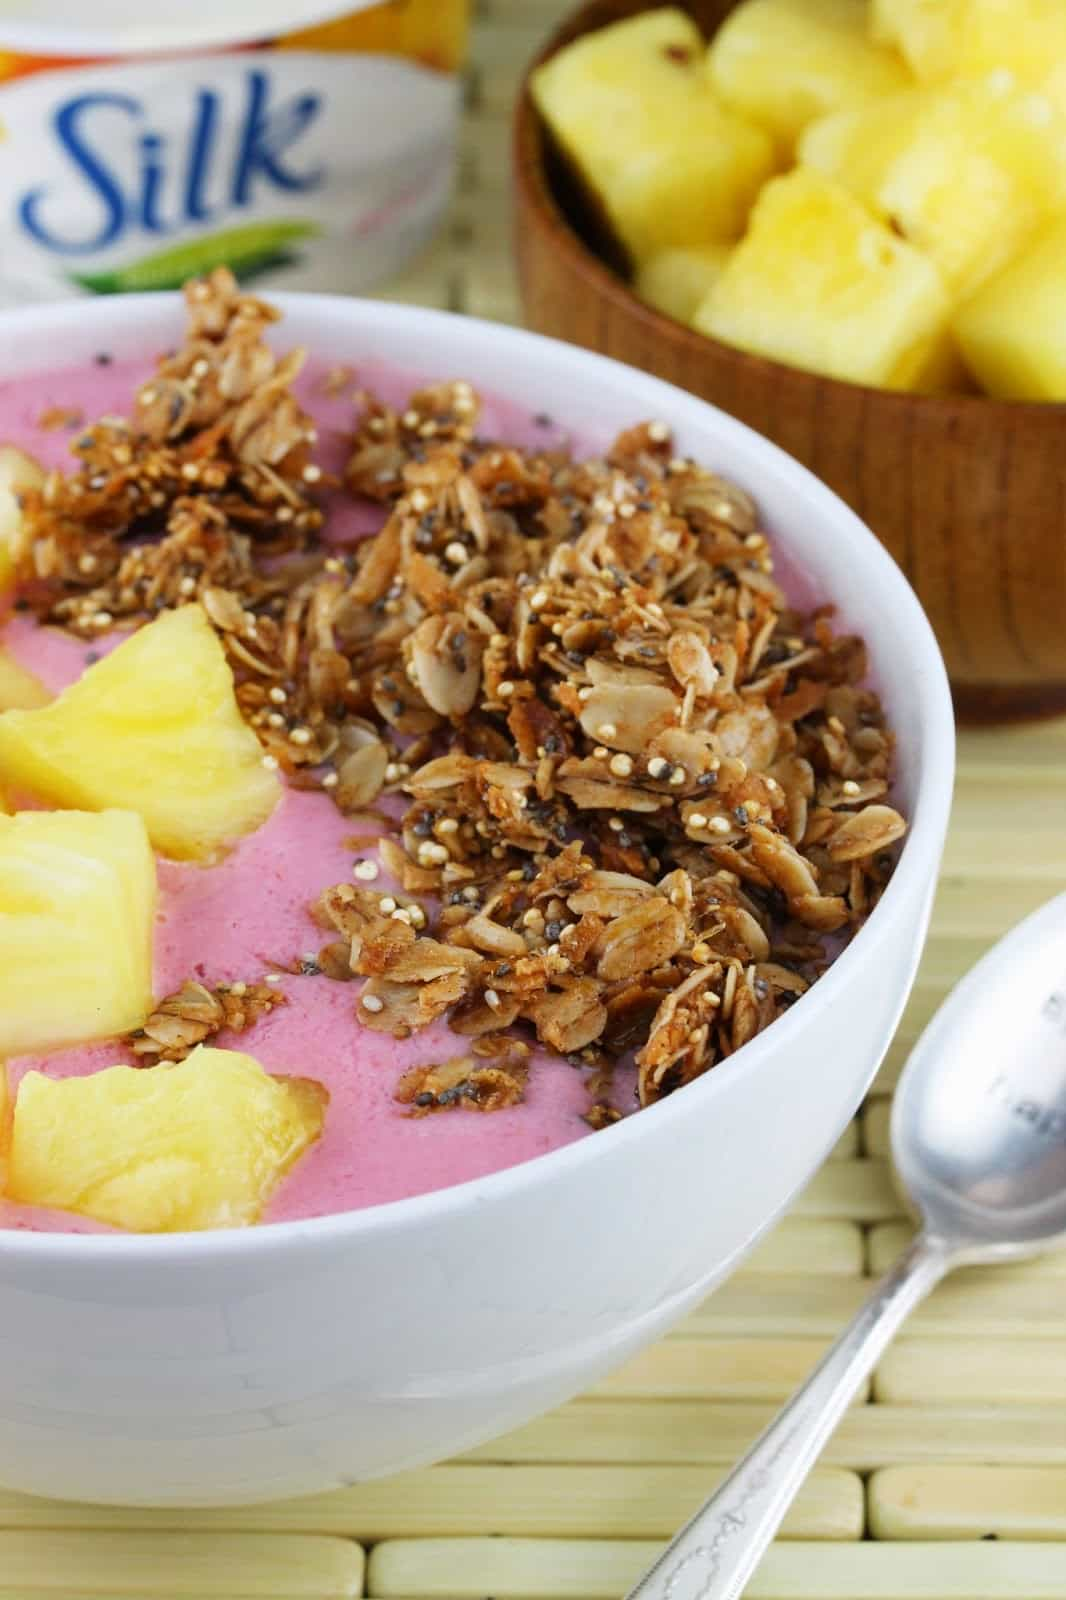 Vegan Tropical Smoothie Breakfast Bowl with Silk Dairy-Free Yogurt Alternative